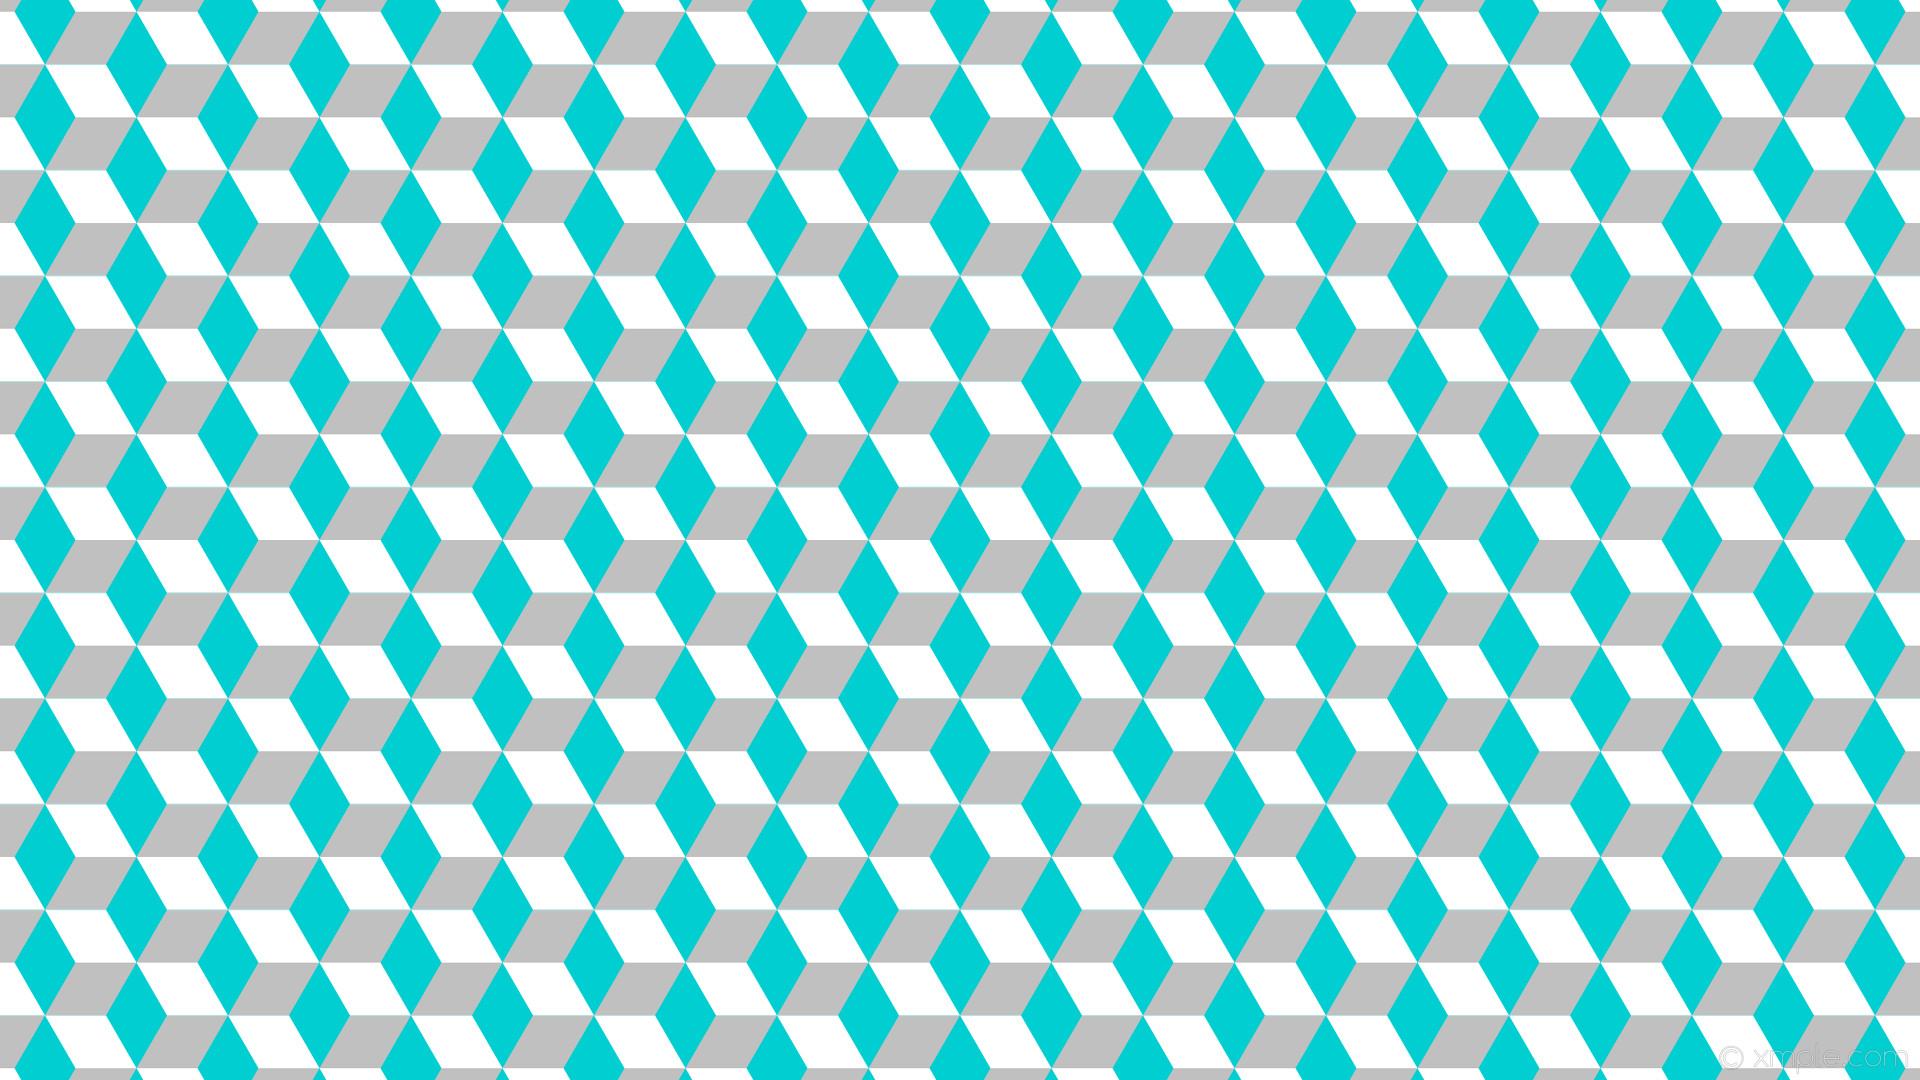 wallpaper white 3d cubes blue grey dark turquoise silver #00ced1 #c0c0c0  #ffffff 90